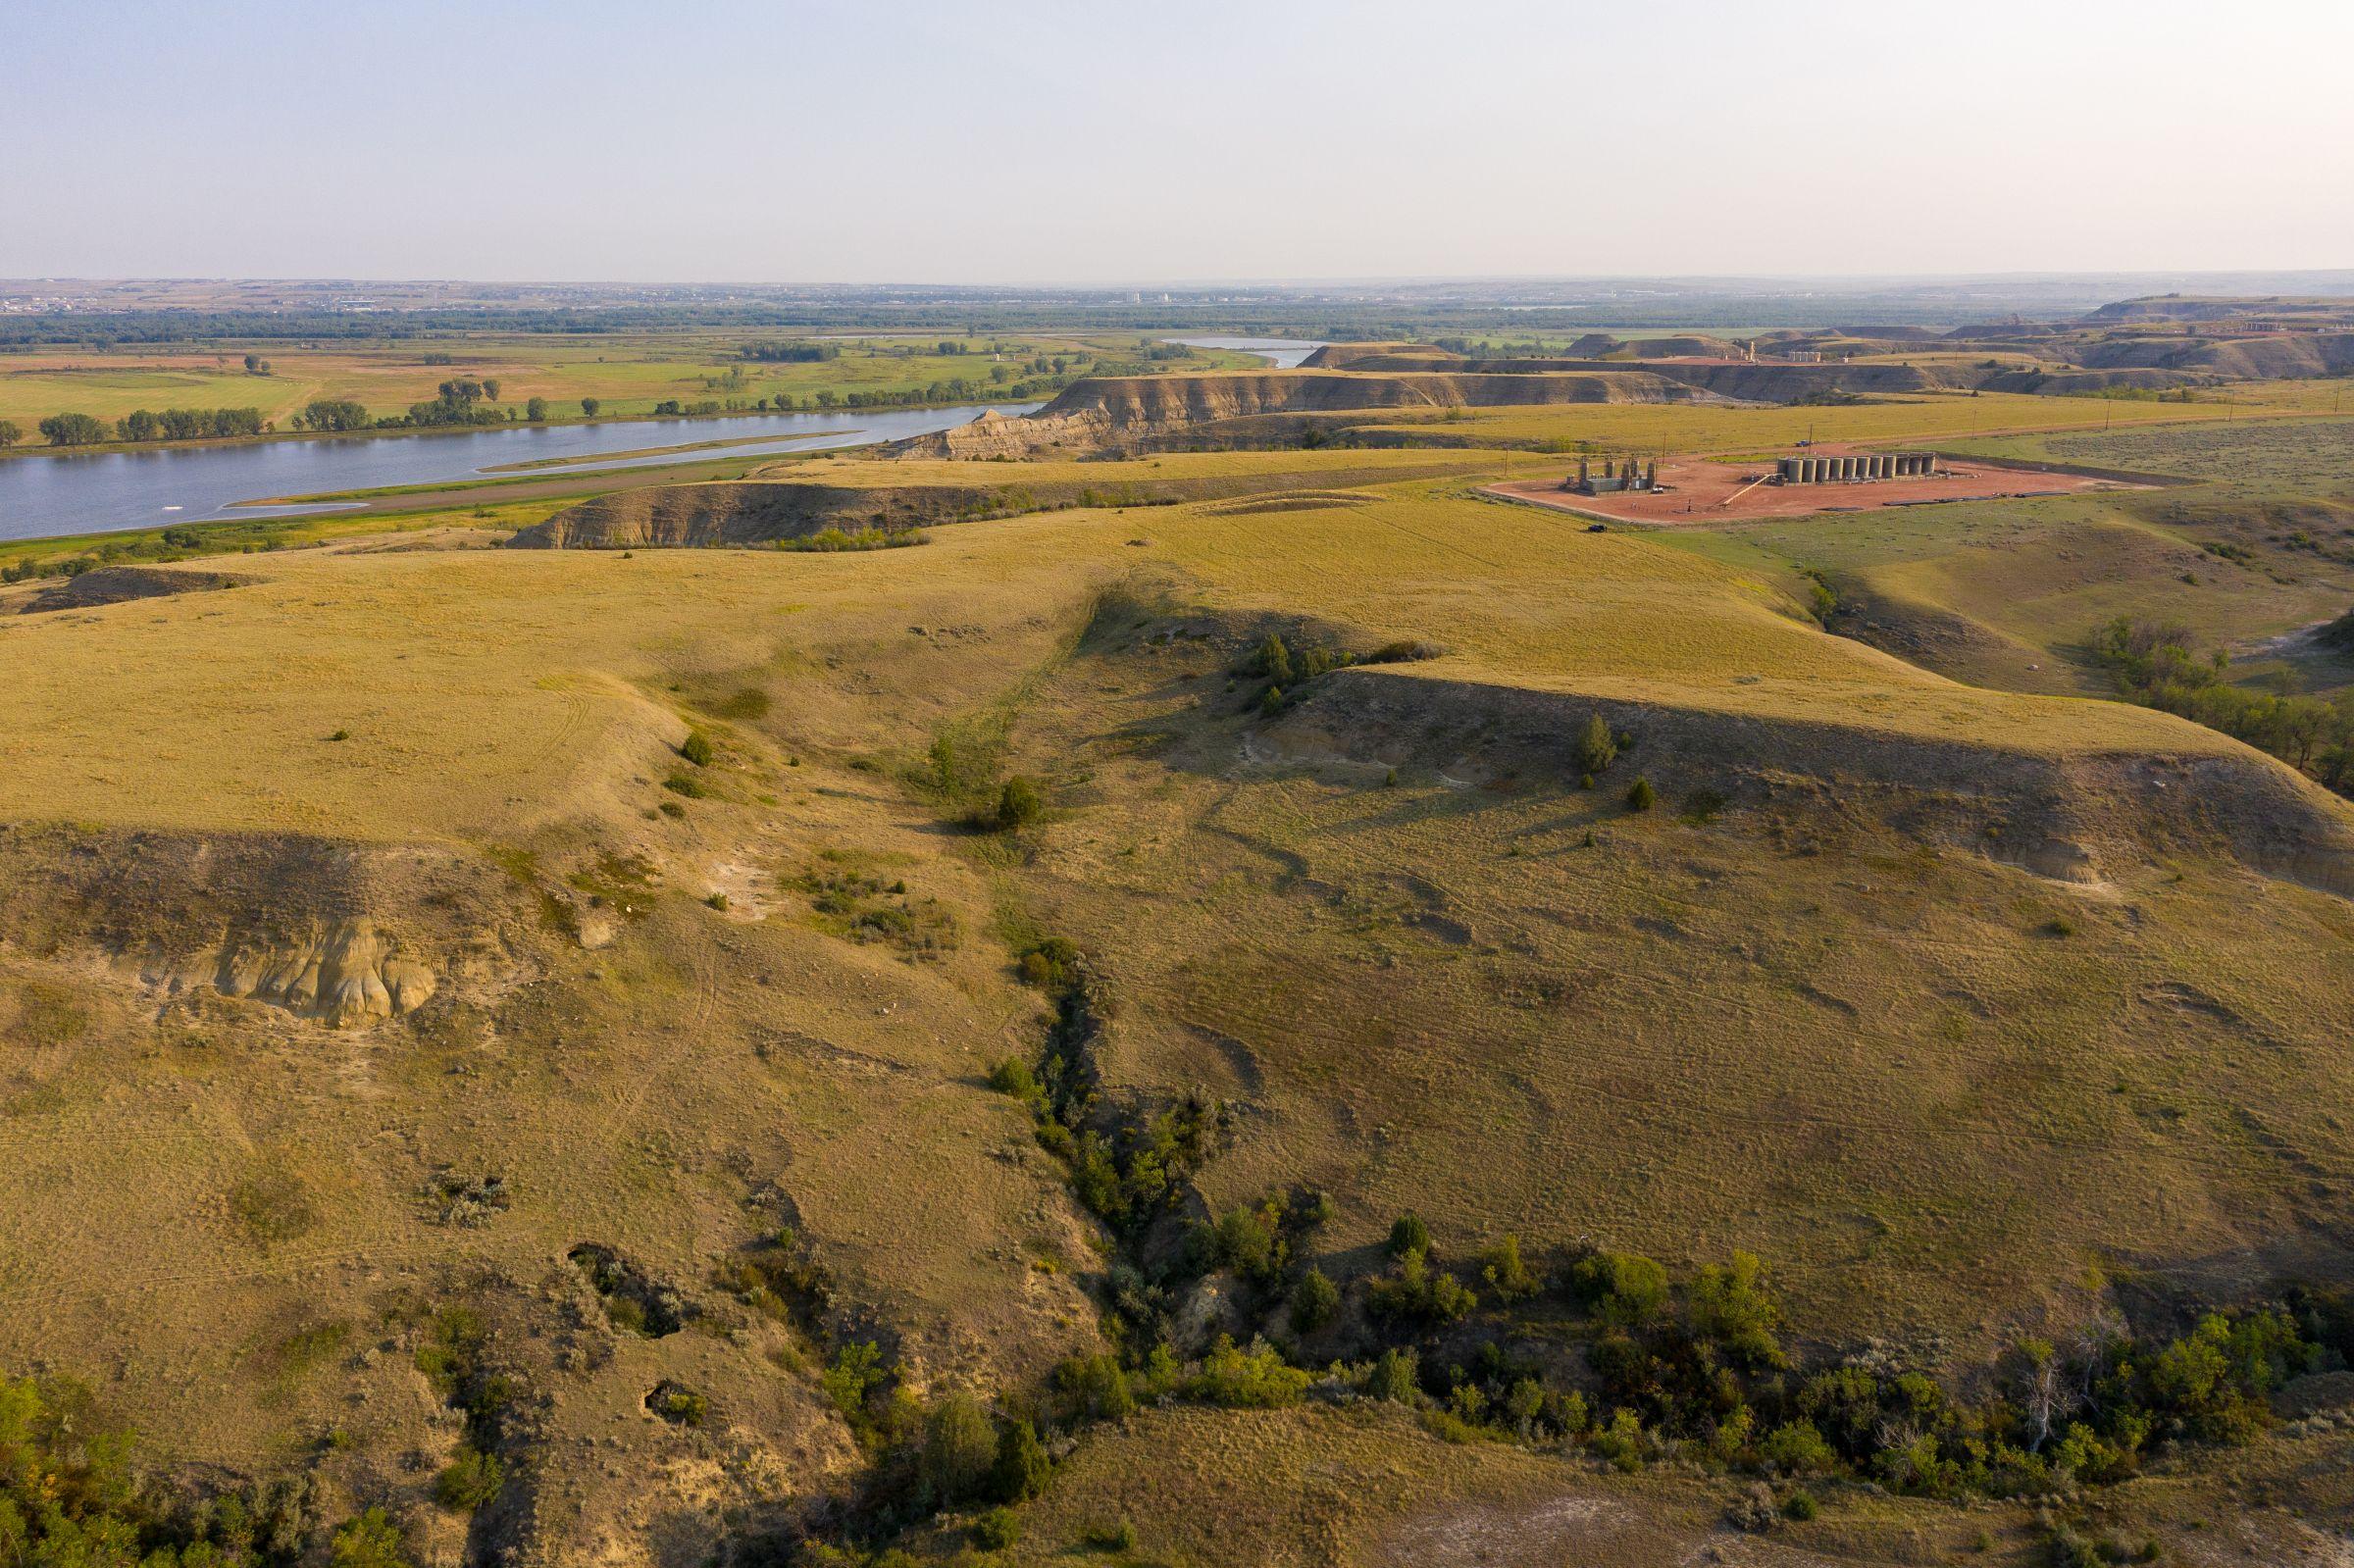 auctions-land-mckenzie-county-north-dakota-270-acres-listing-number-15735-2-2021-09-09-211356.jpeg